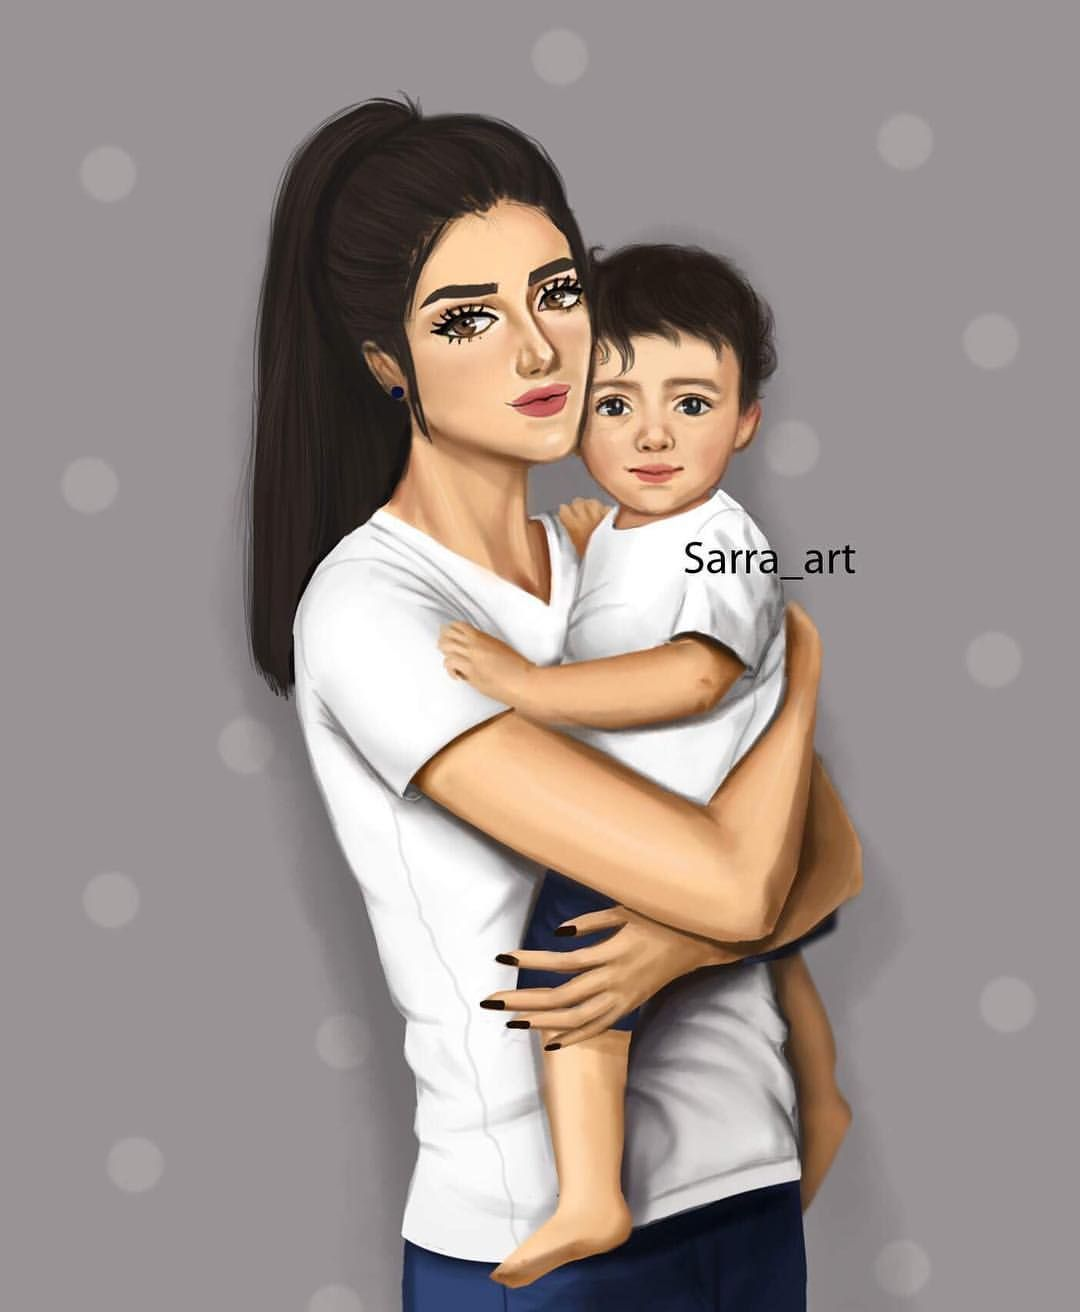 4 789 Likes 428 Comments Sara Ahmed Sarra Art On Instagram ابن اختي هو ابني التي لم تلده بطني Sarra Art Mother Art Mom Art